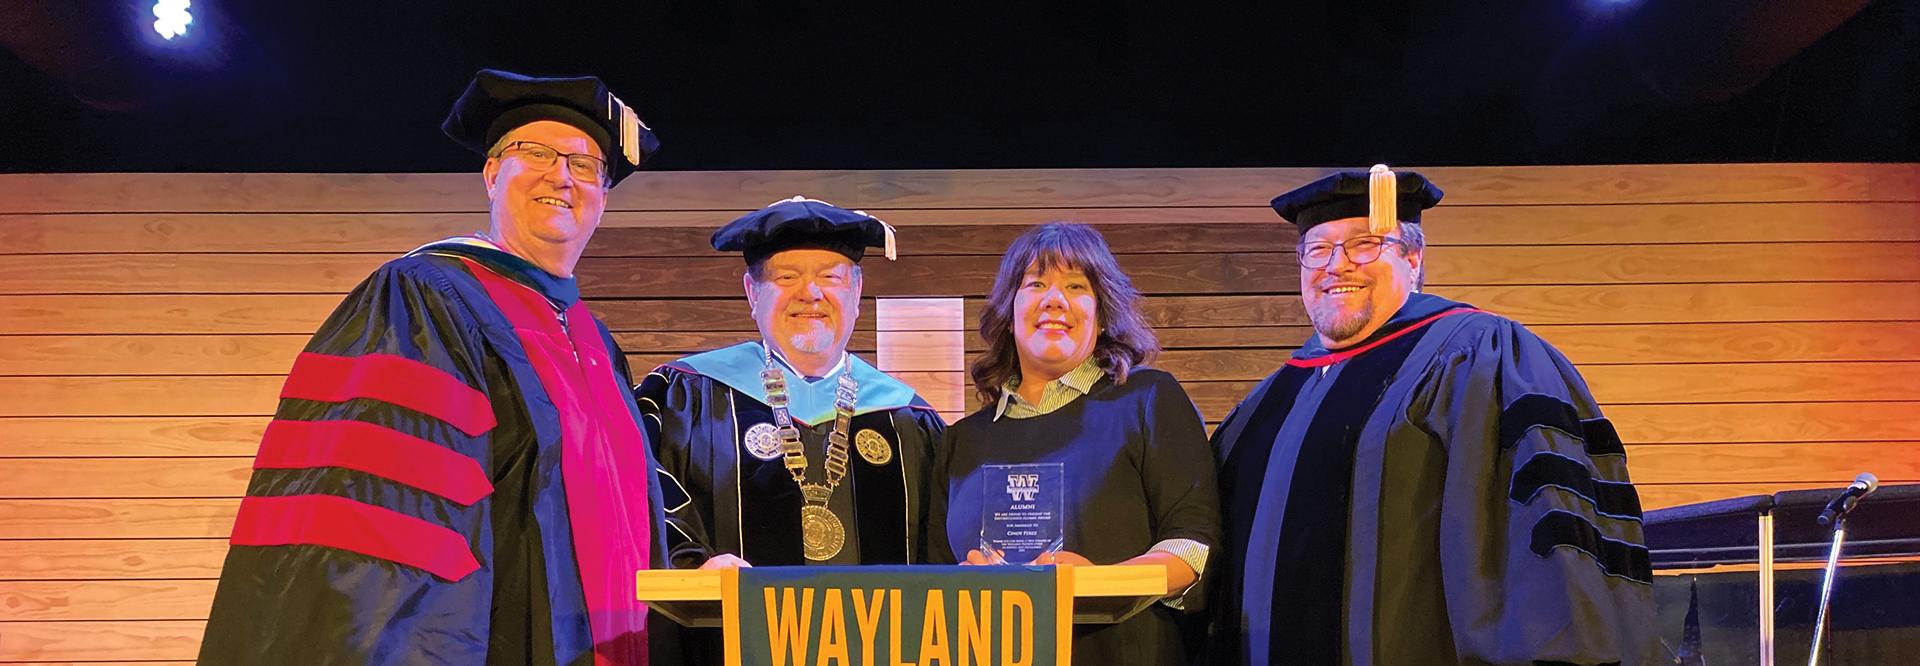 Three men in academic regalia present a woman with a crystal award